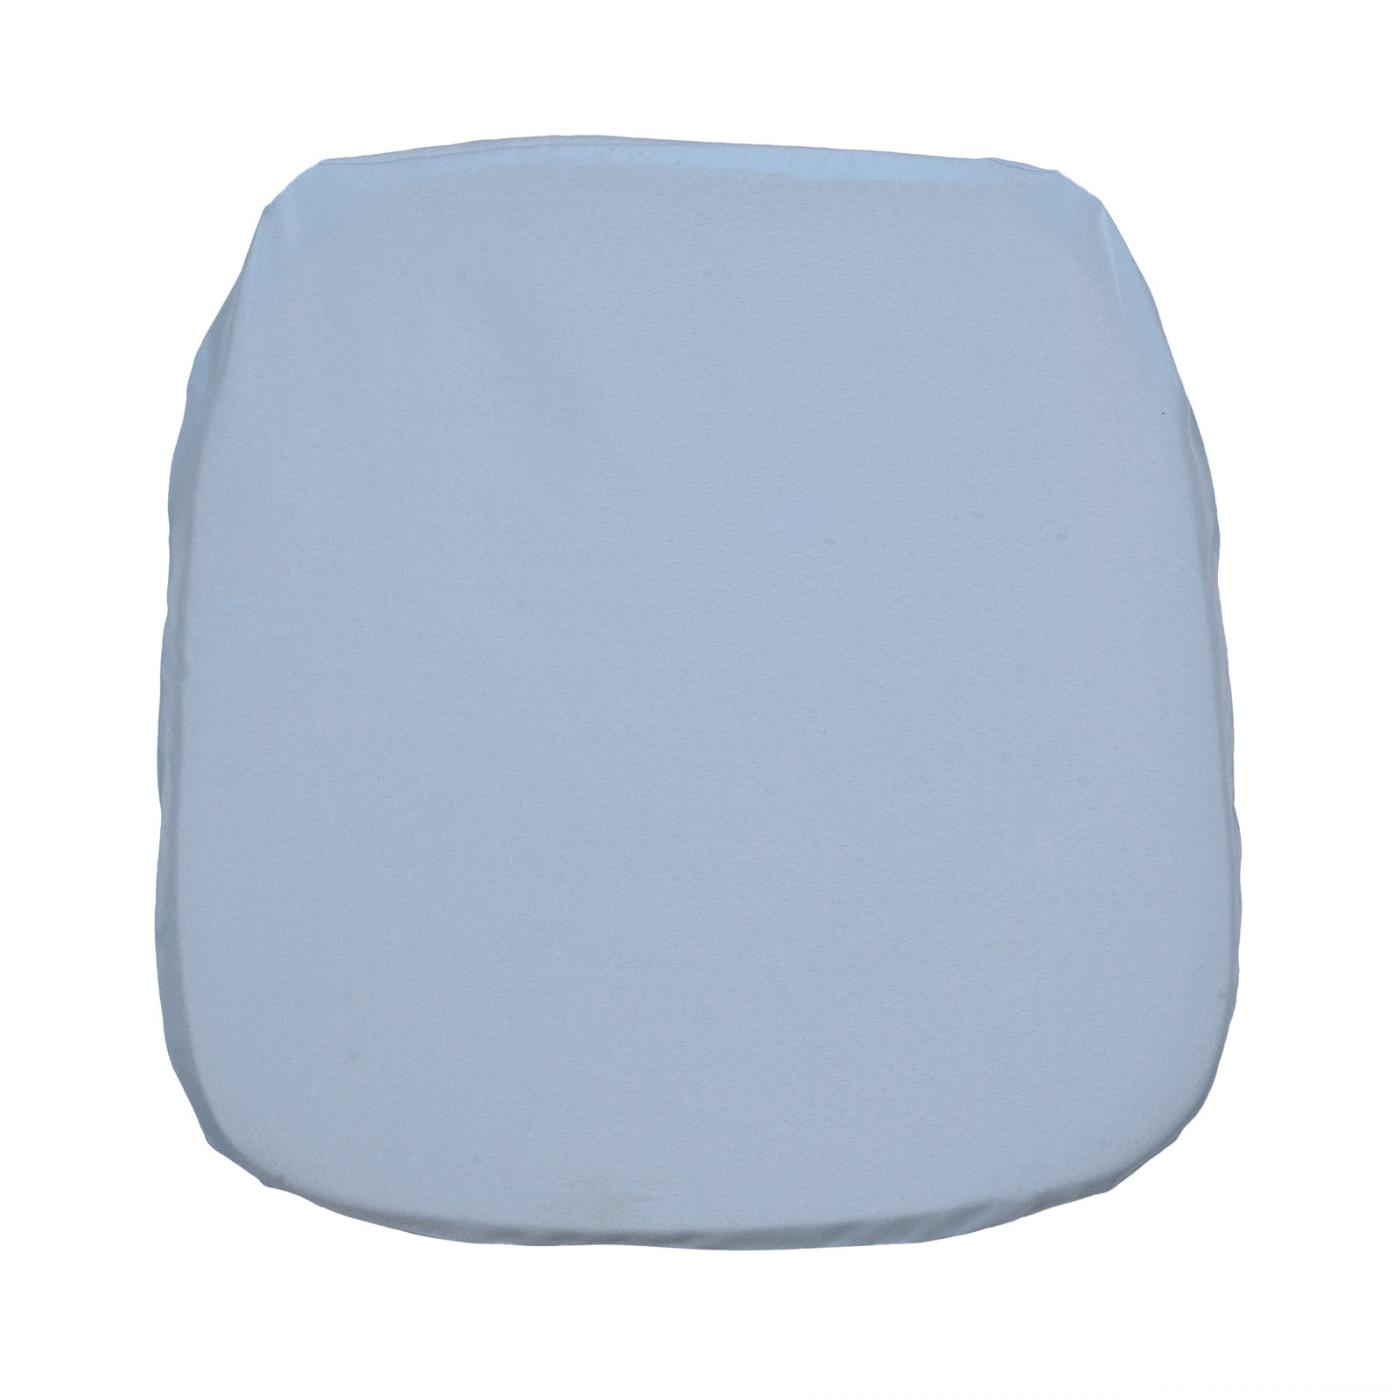 Poly Seat Cushion - Light Blue